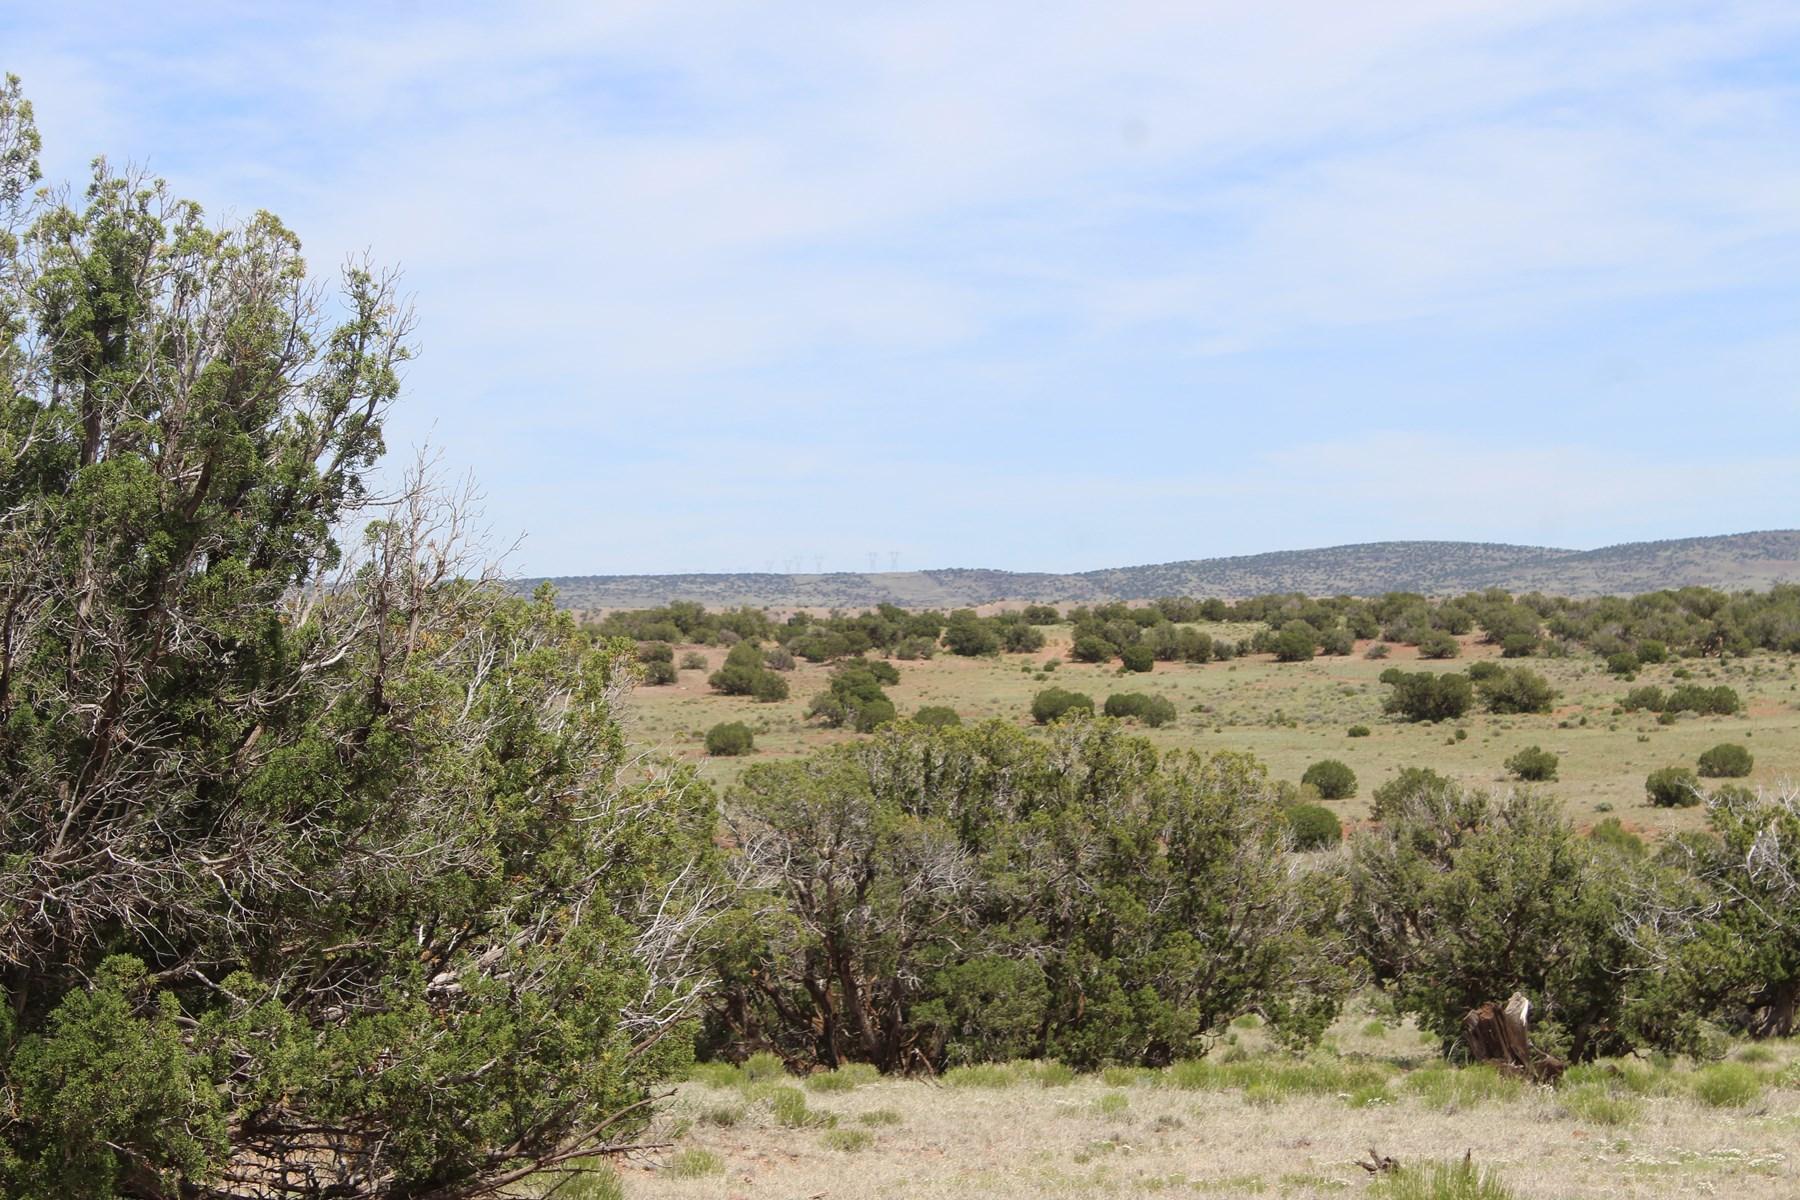 Acreage for Sale in Eastern AZ, Good wells in Area